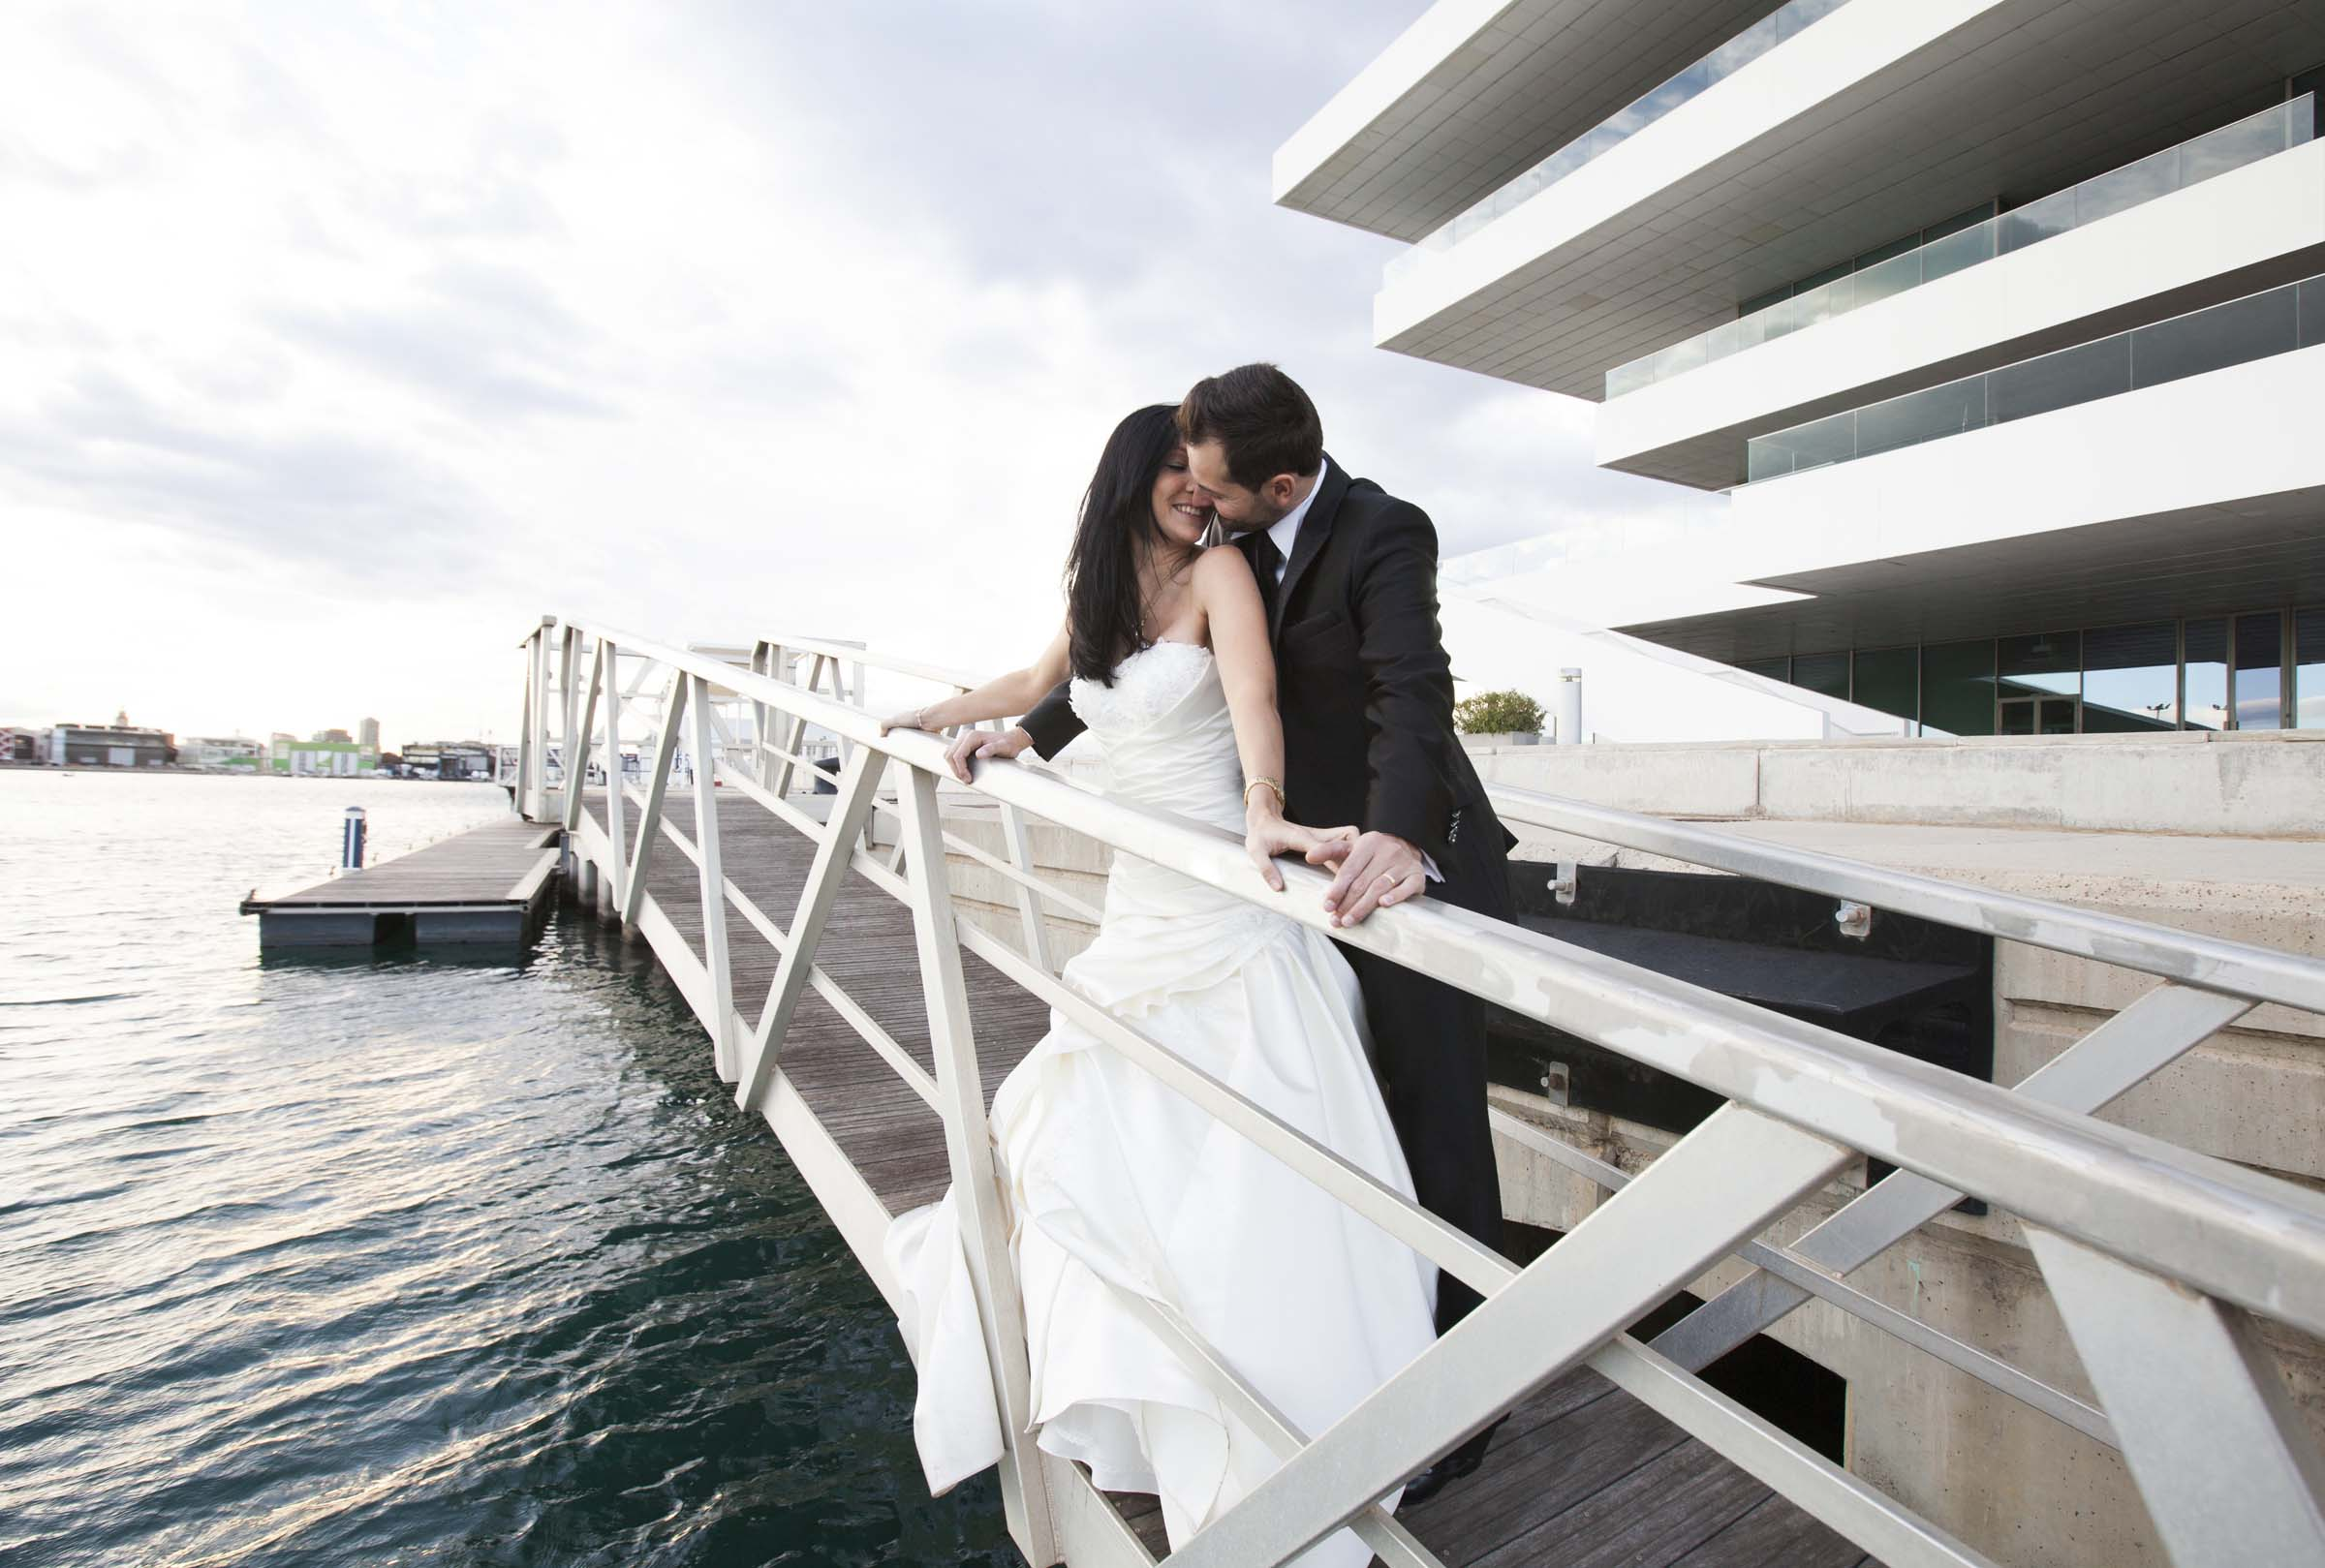 fotografia-bodas-valencia-felguera-fotografo-slider-6_1